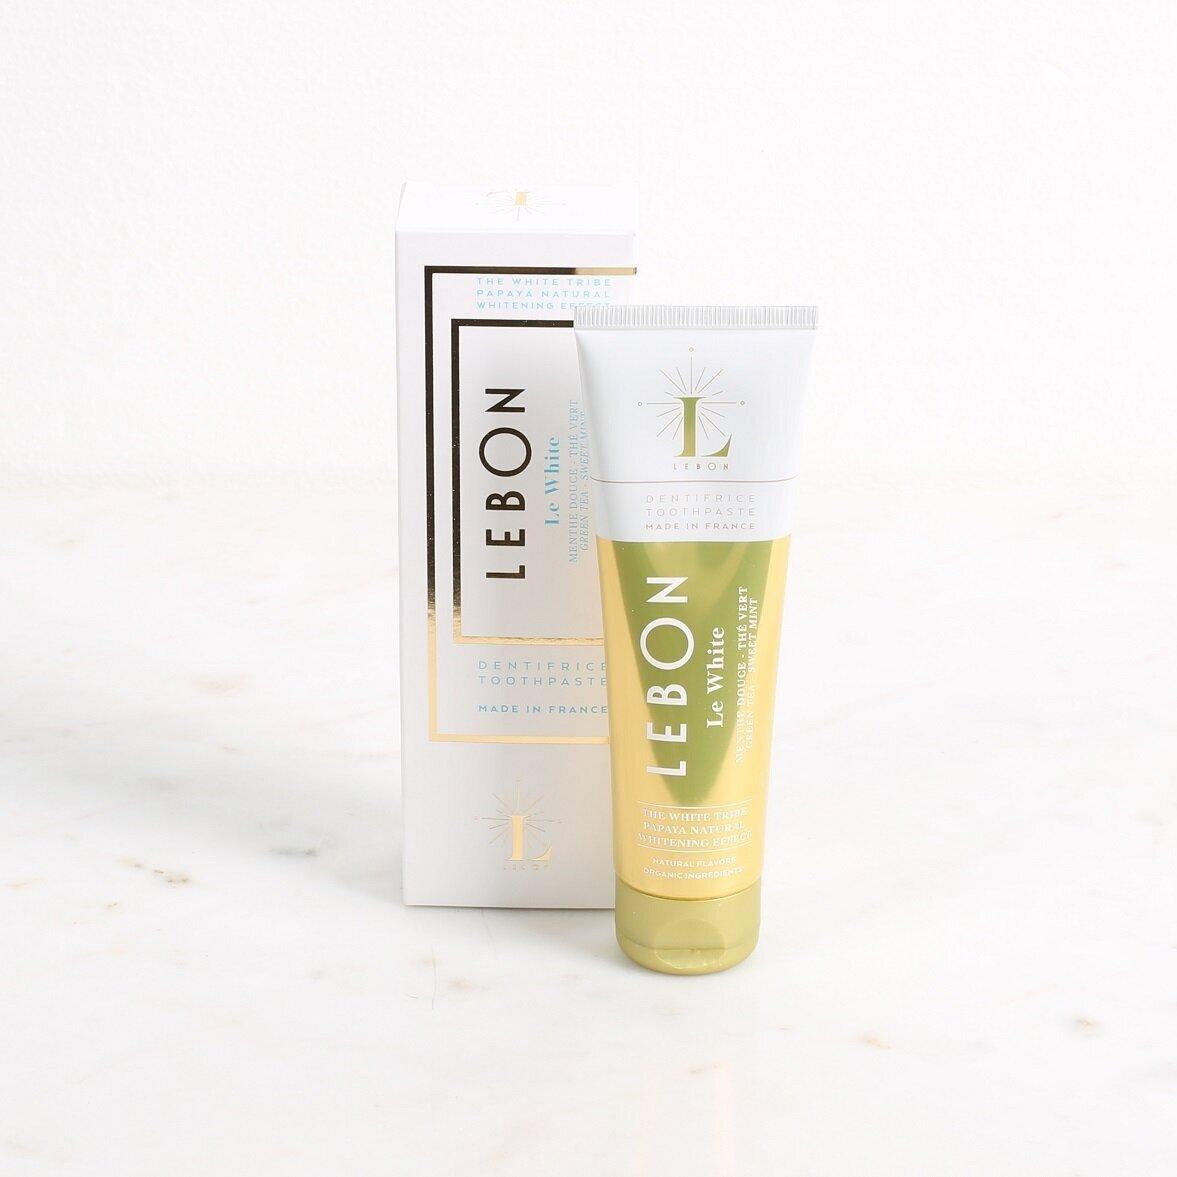 LEBON Green Tea and Sweet Mint Toothpaste